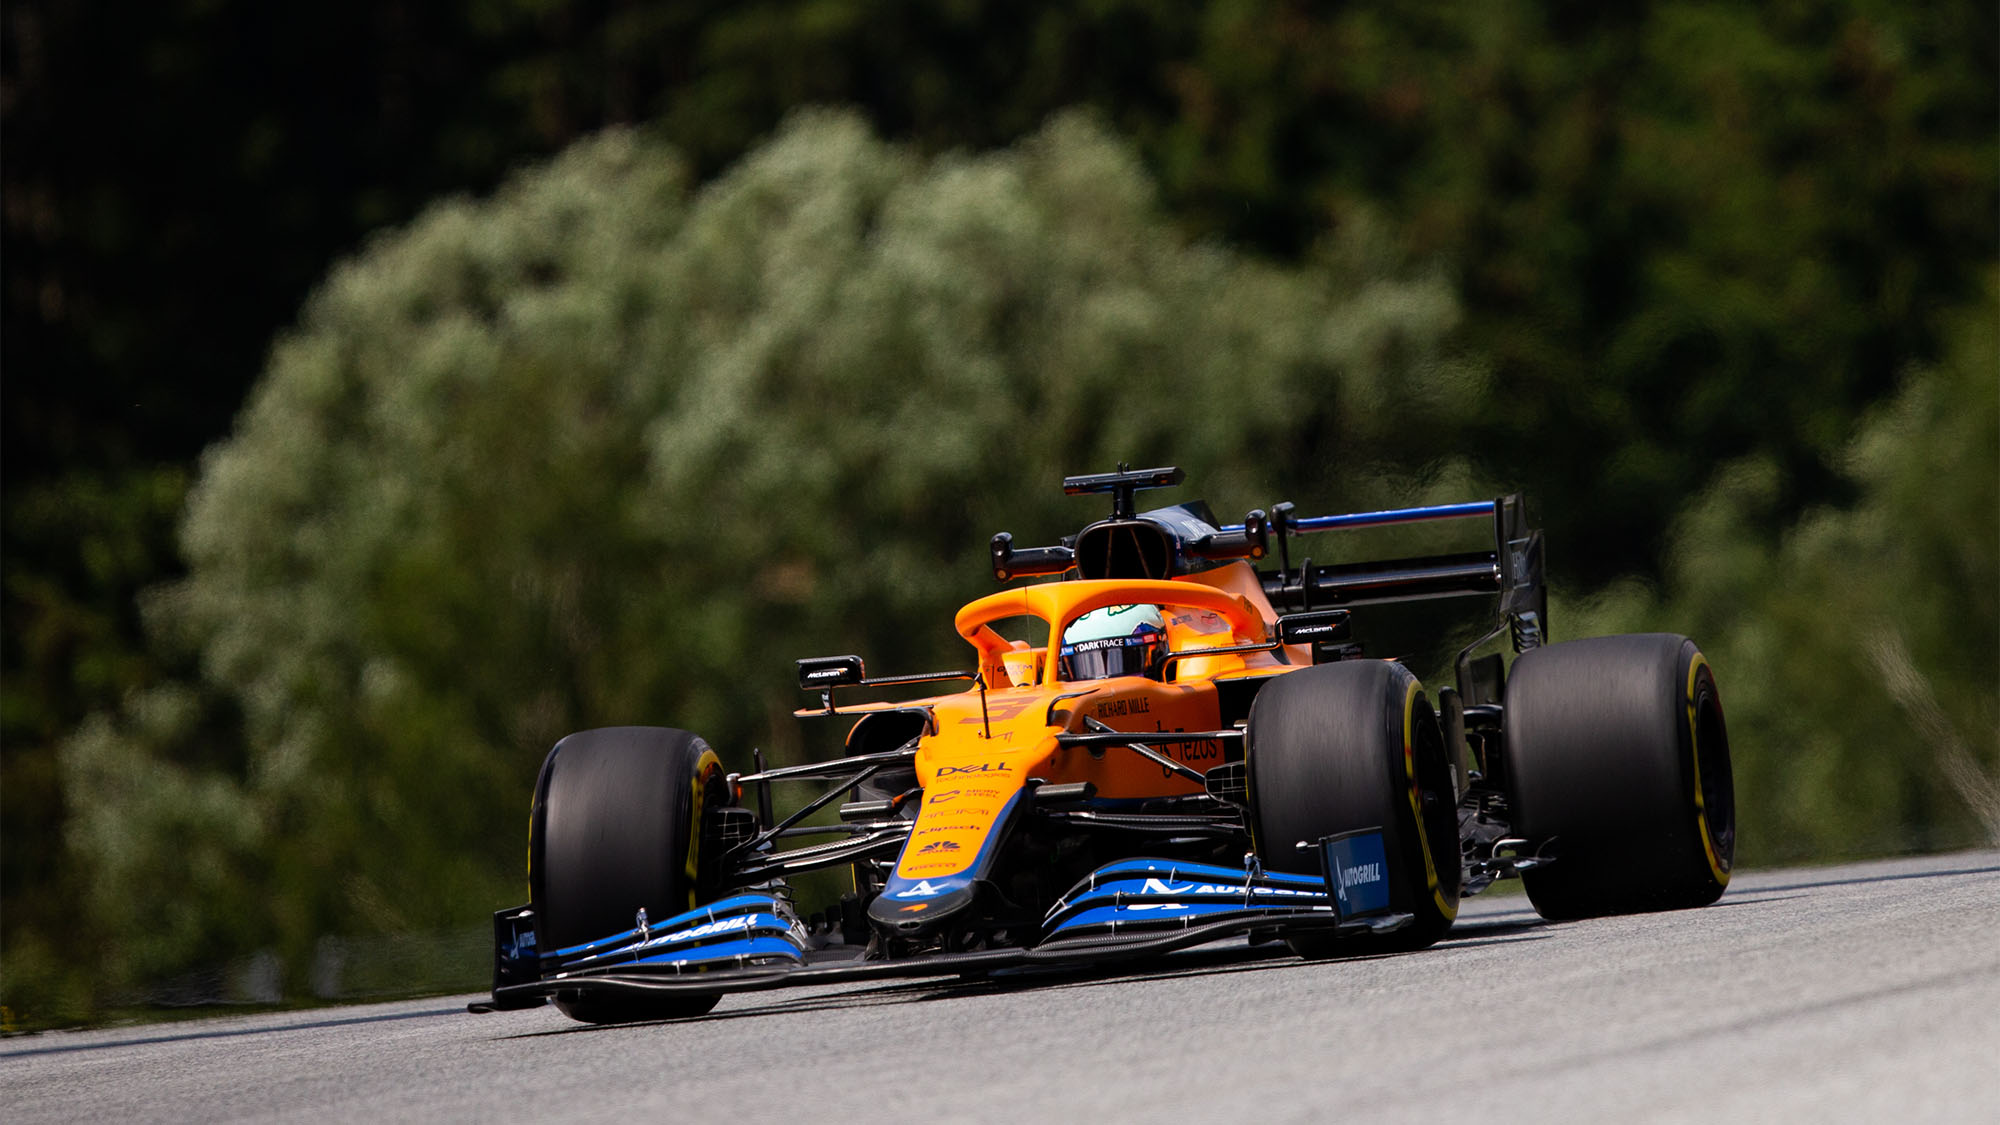 Daniel Ricciardo Styria 2021